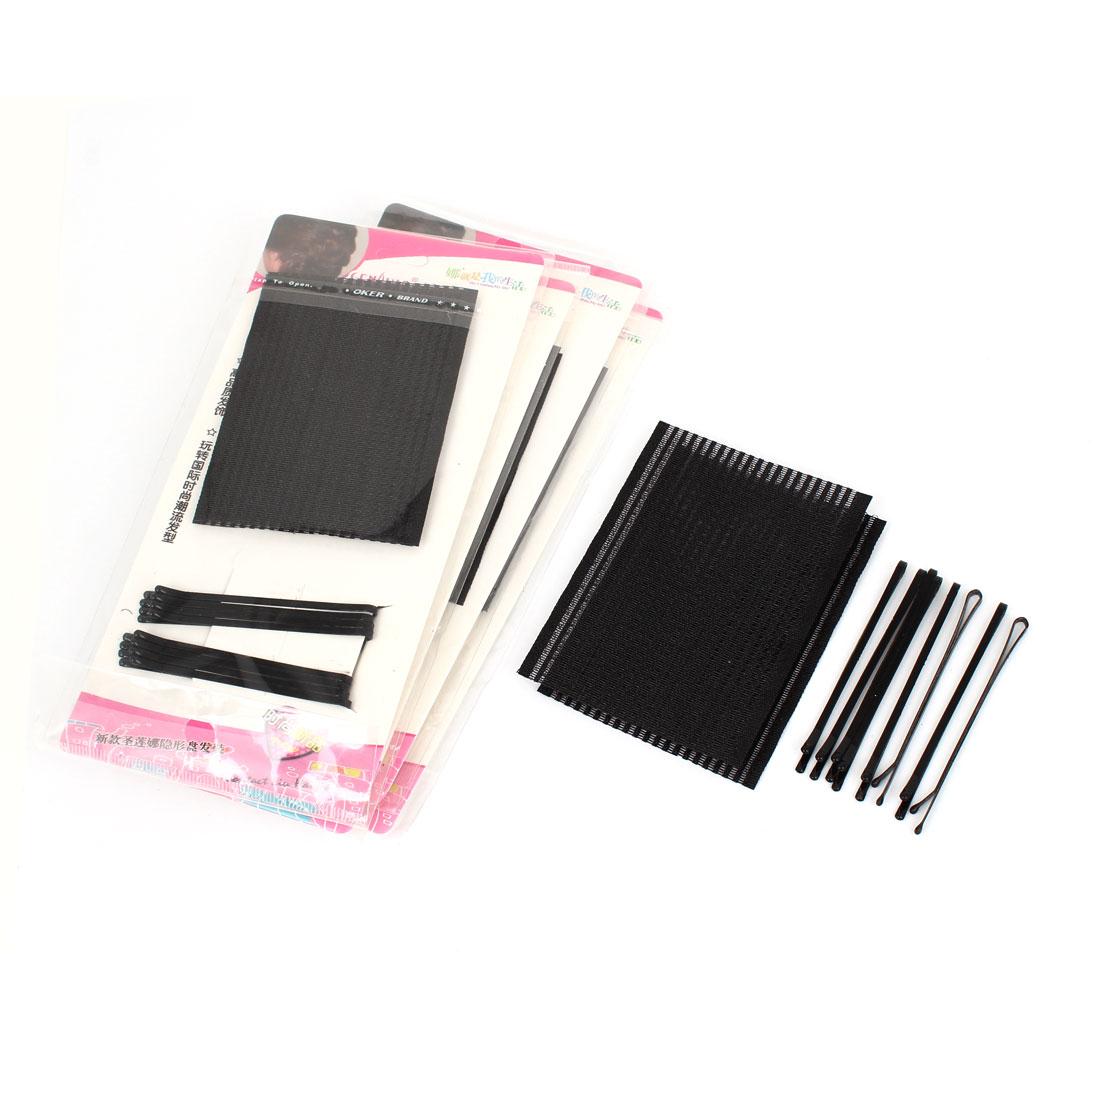 5 Bags Black Make Up Magic Sheet + Bobby Pin DIY Hairstyle Holding Foretop Hair Bangs